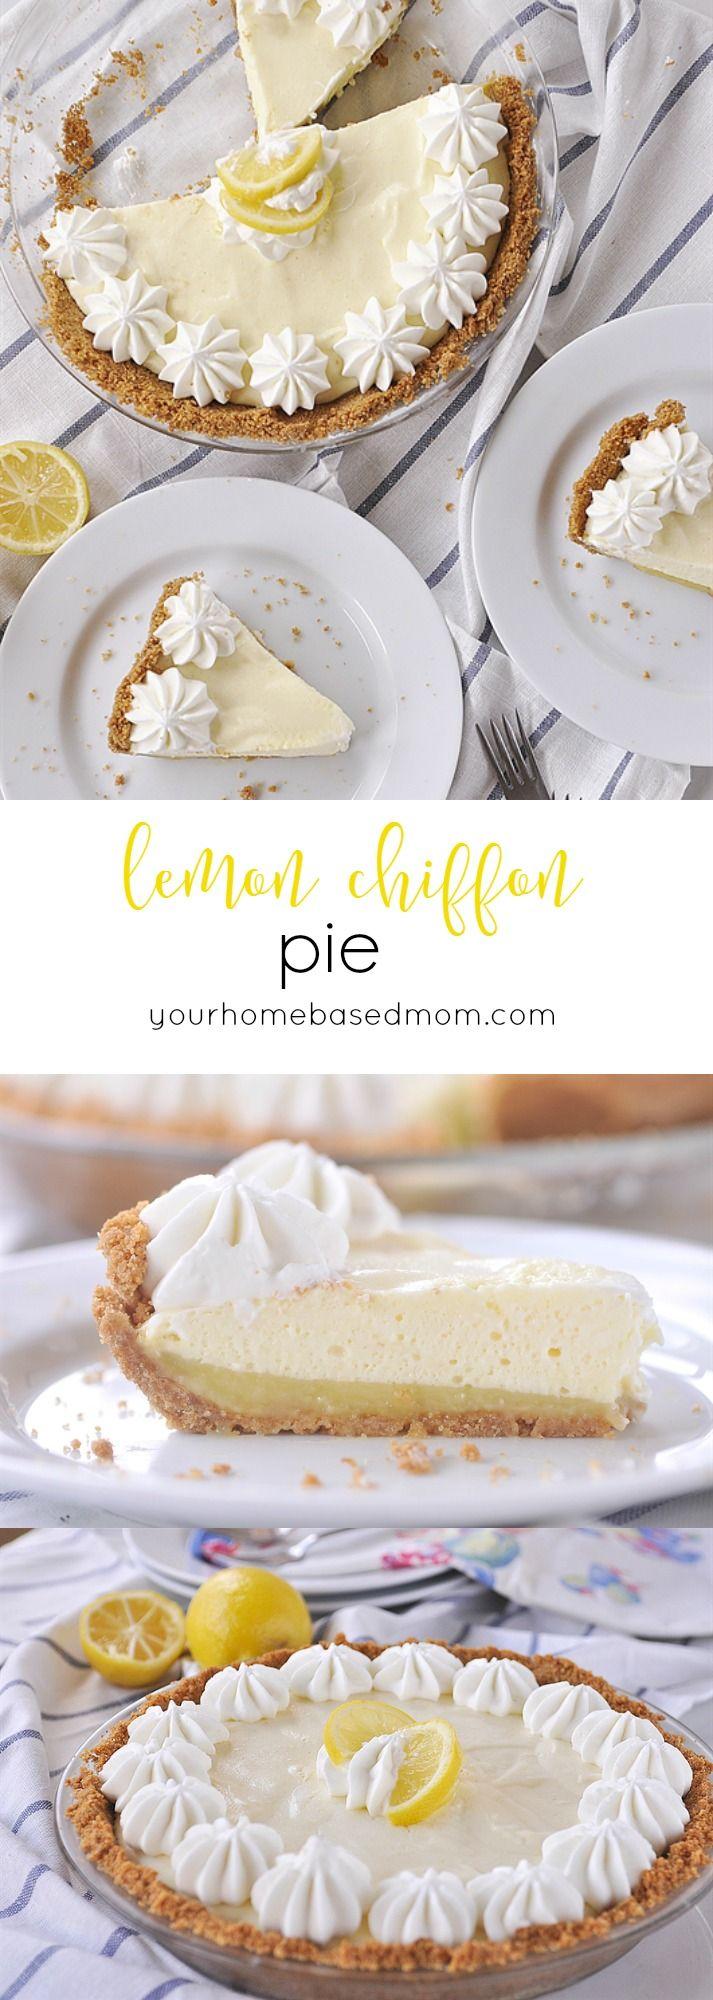 lemon chiffon pie, a light and fluffy delicious lemon pie